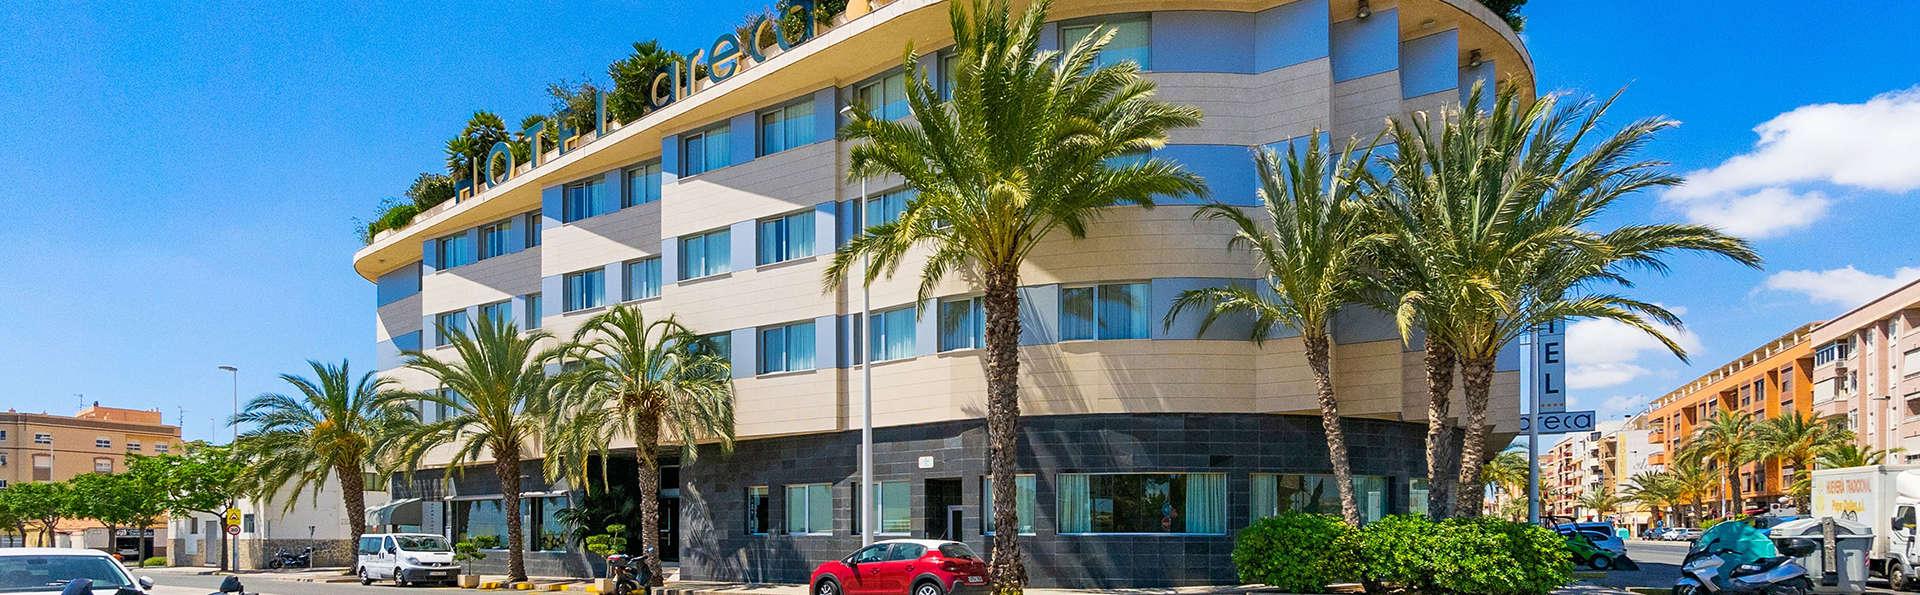 Hotel Areca  - EDIT_FRONT.jpg